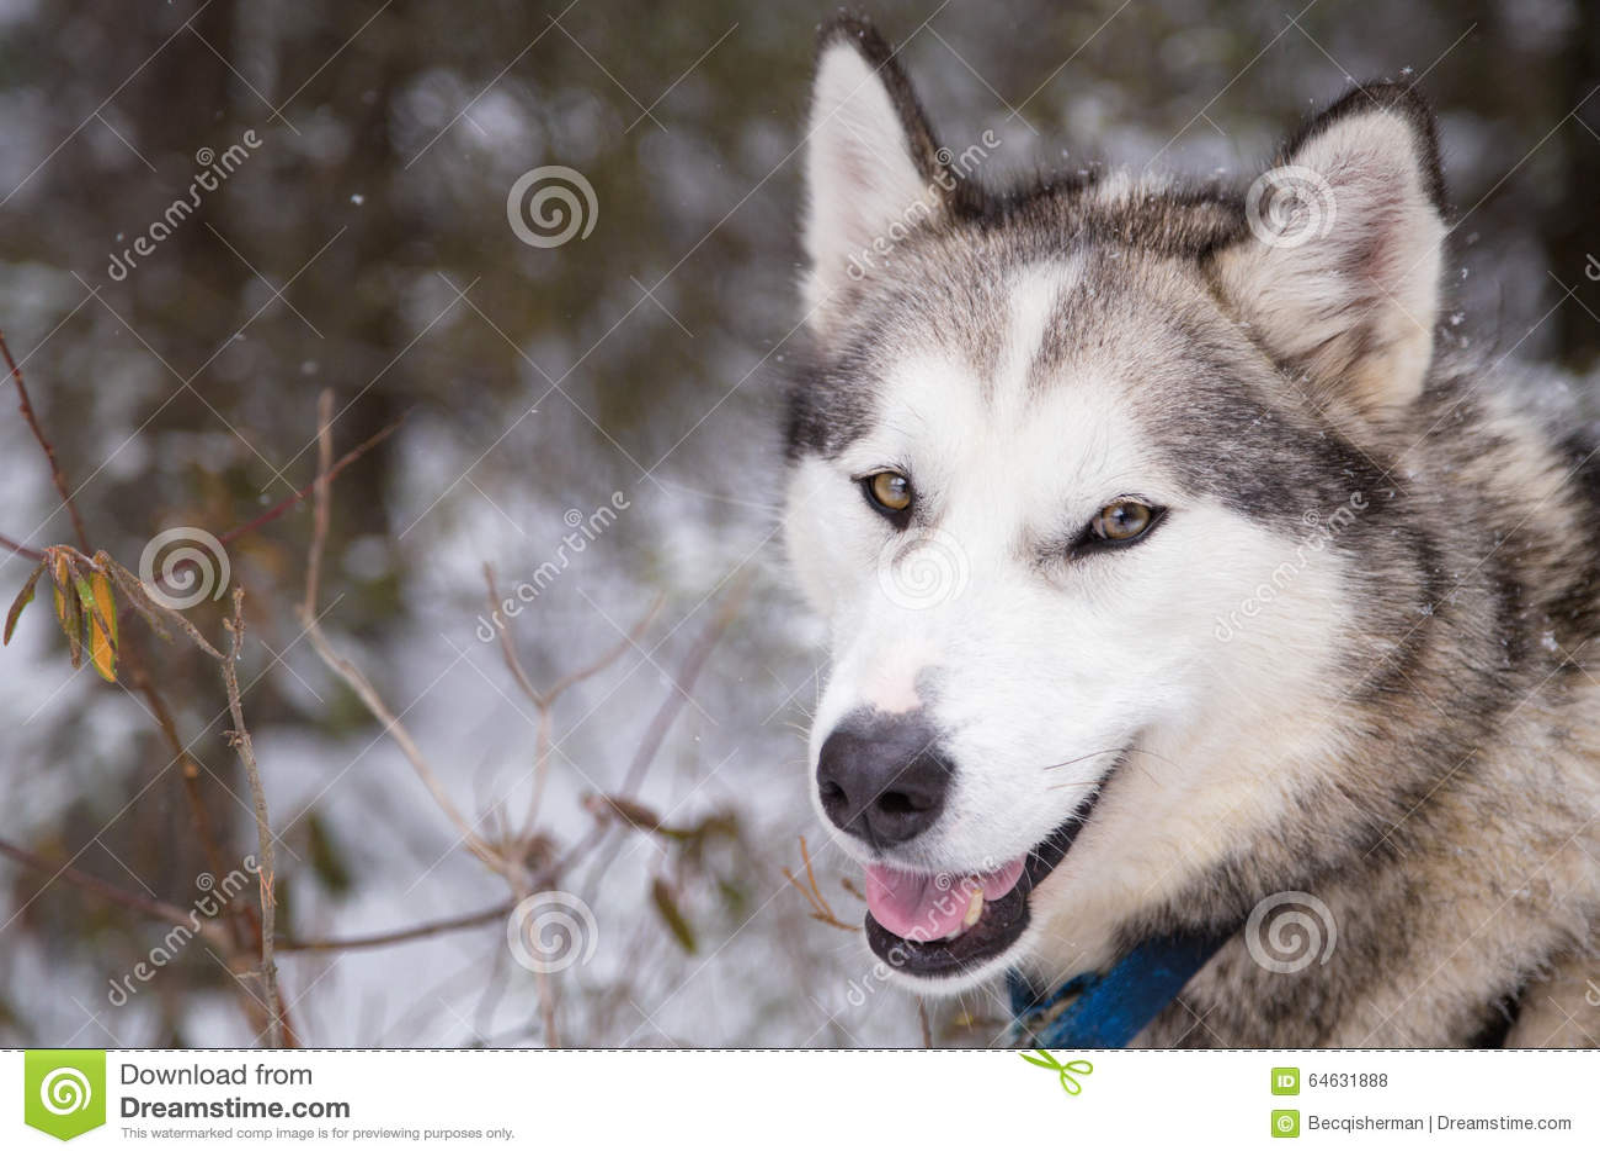 Inuit Sled Dog Close Up Face Ready to go Dogsledding in Minnesota